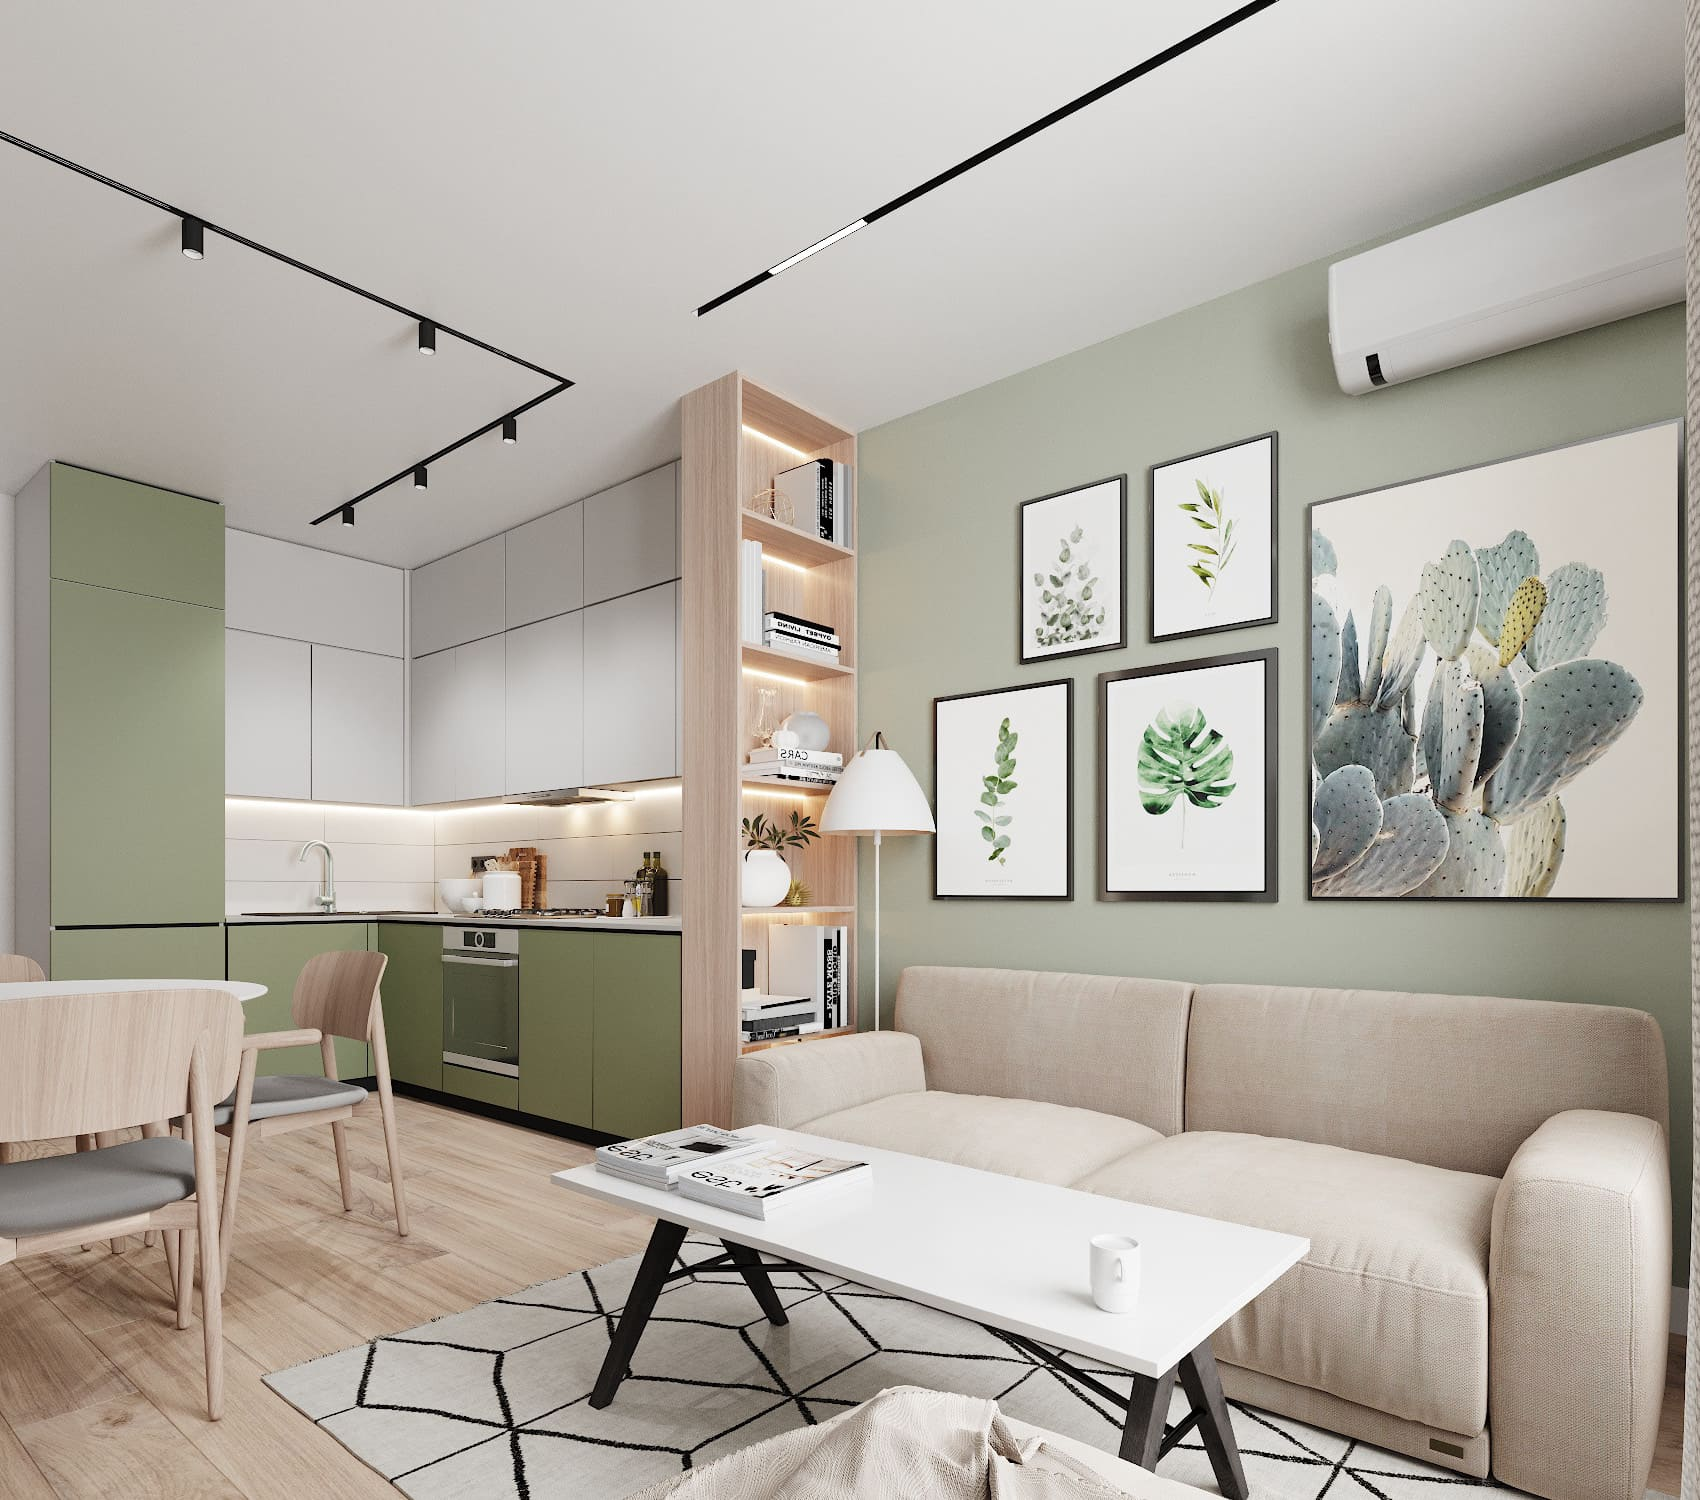 дизайн интерьера модной квартиры фото 88